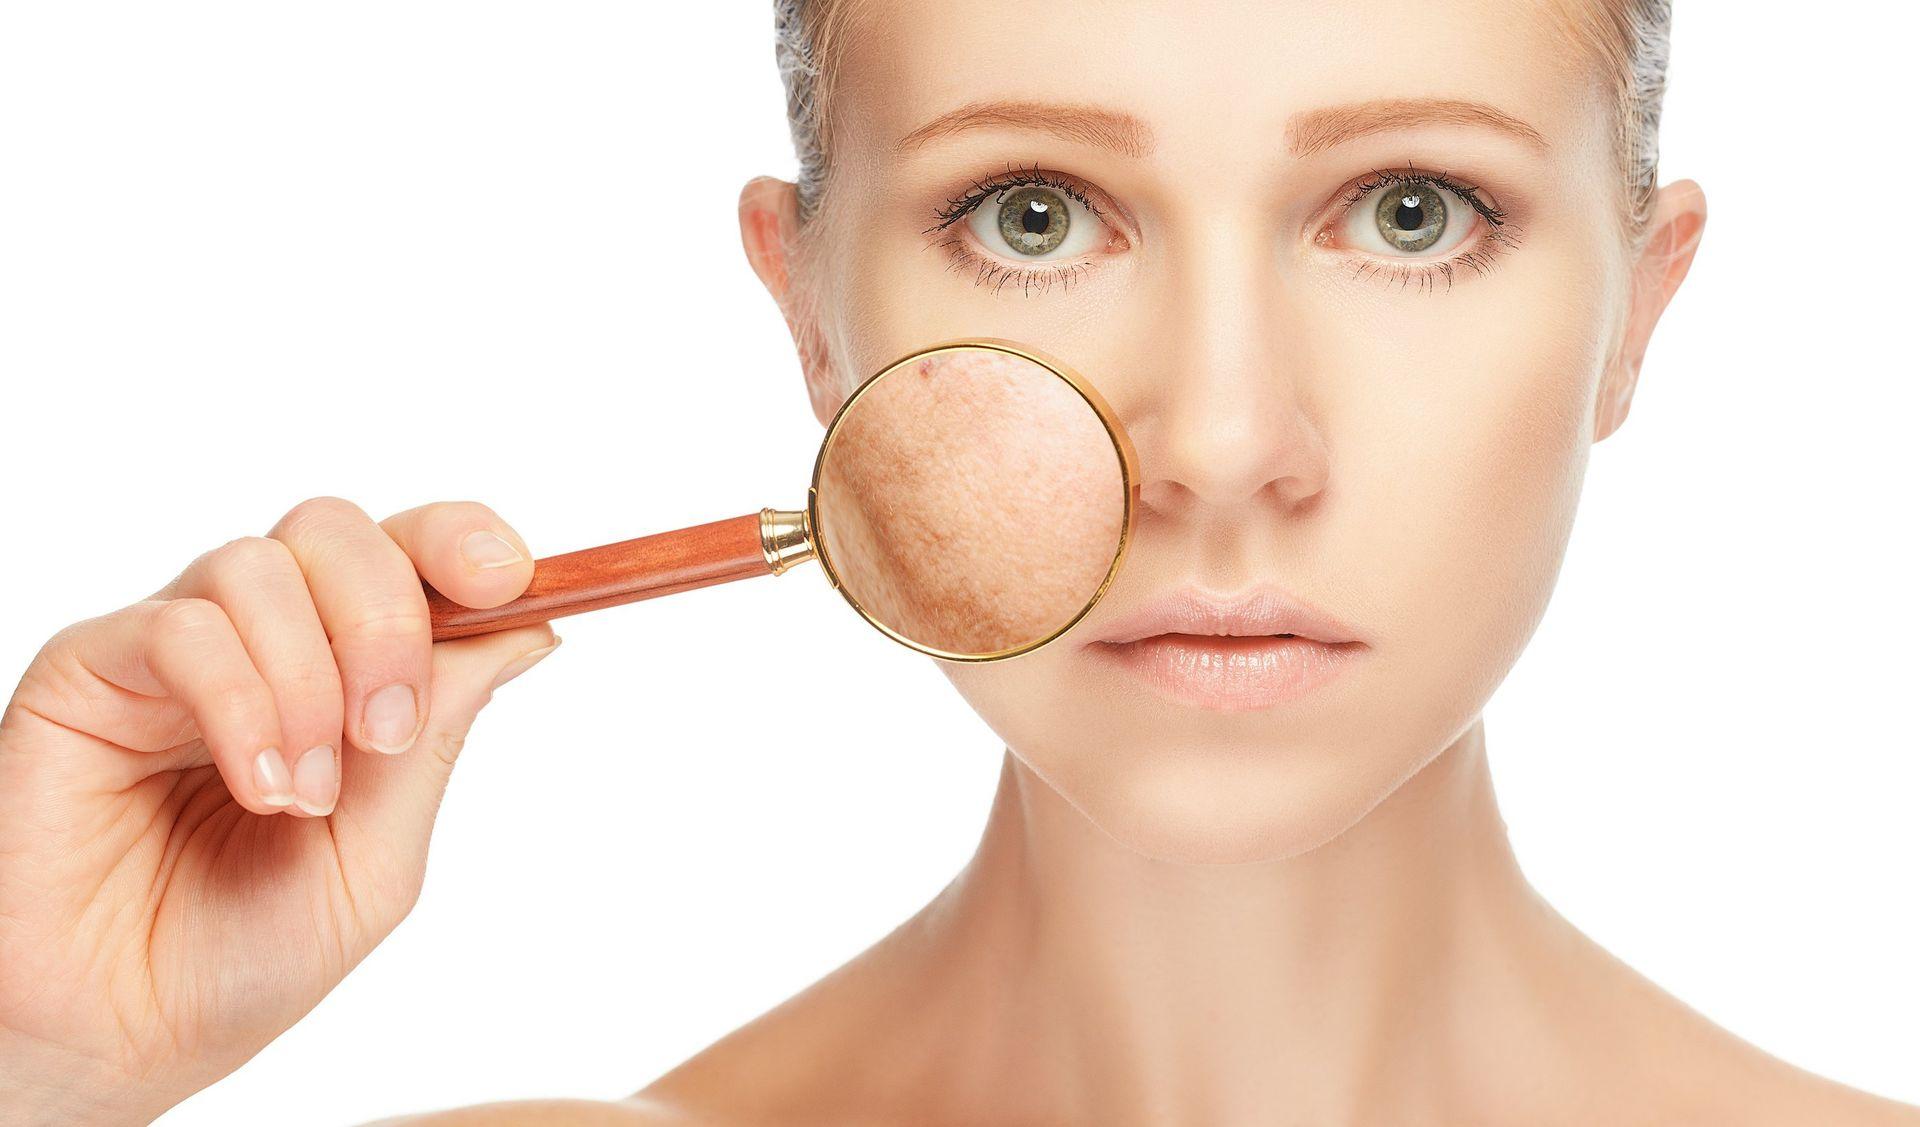 bigstock-concept-skincare-skin-of-woma-82821593-care